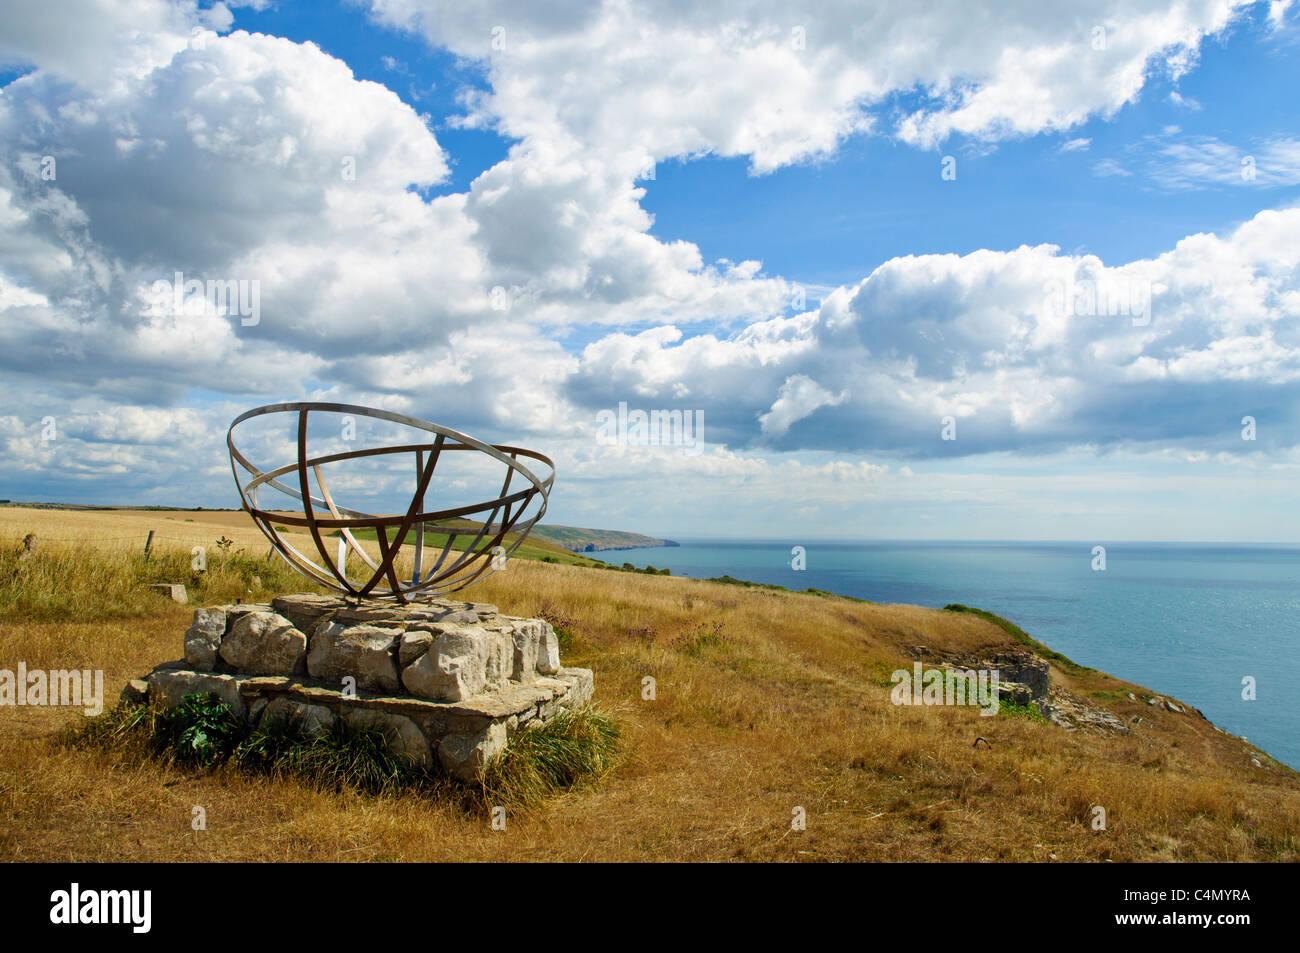 Radar memorial at St Aldhelm's Head, Isle of Purbeck, Dorset designed by Tony Viney - Stock Image